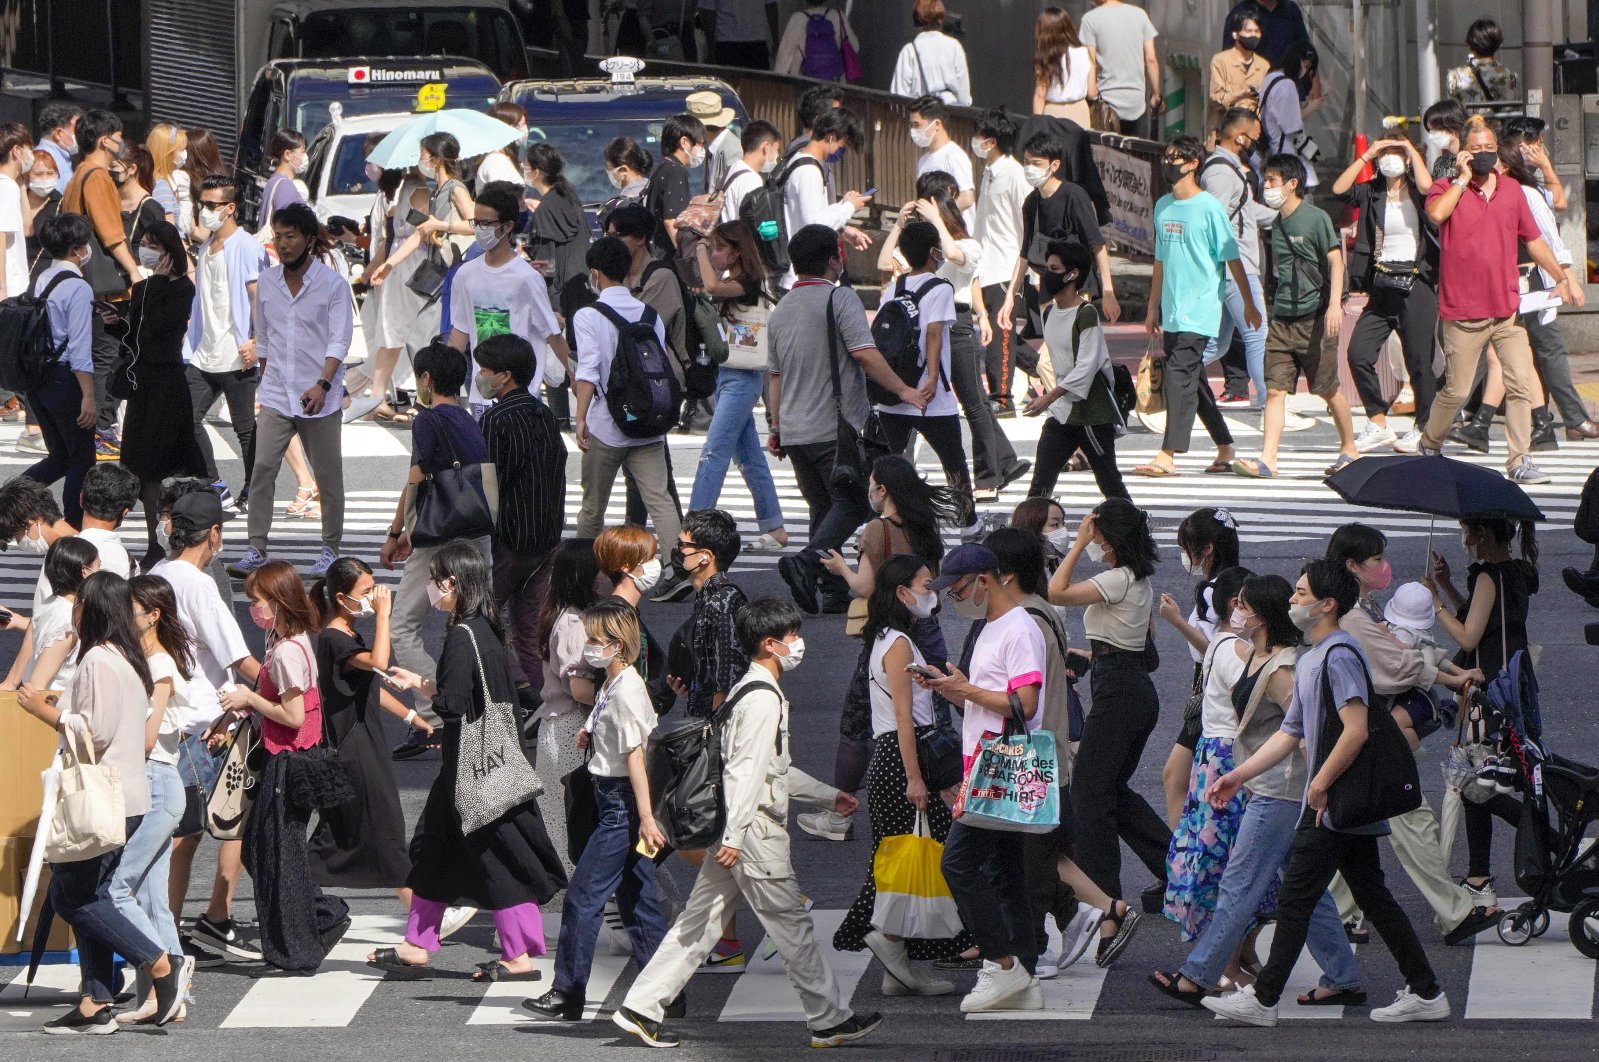 Pedestrians walk a crossway in Tokyo, Japan, Aug. 18, 2021. (EPA Photo)